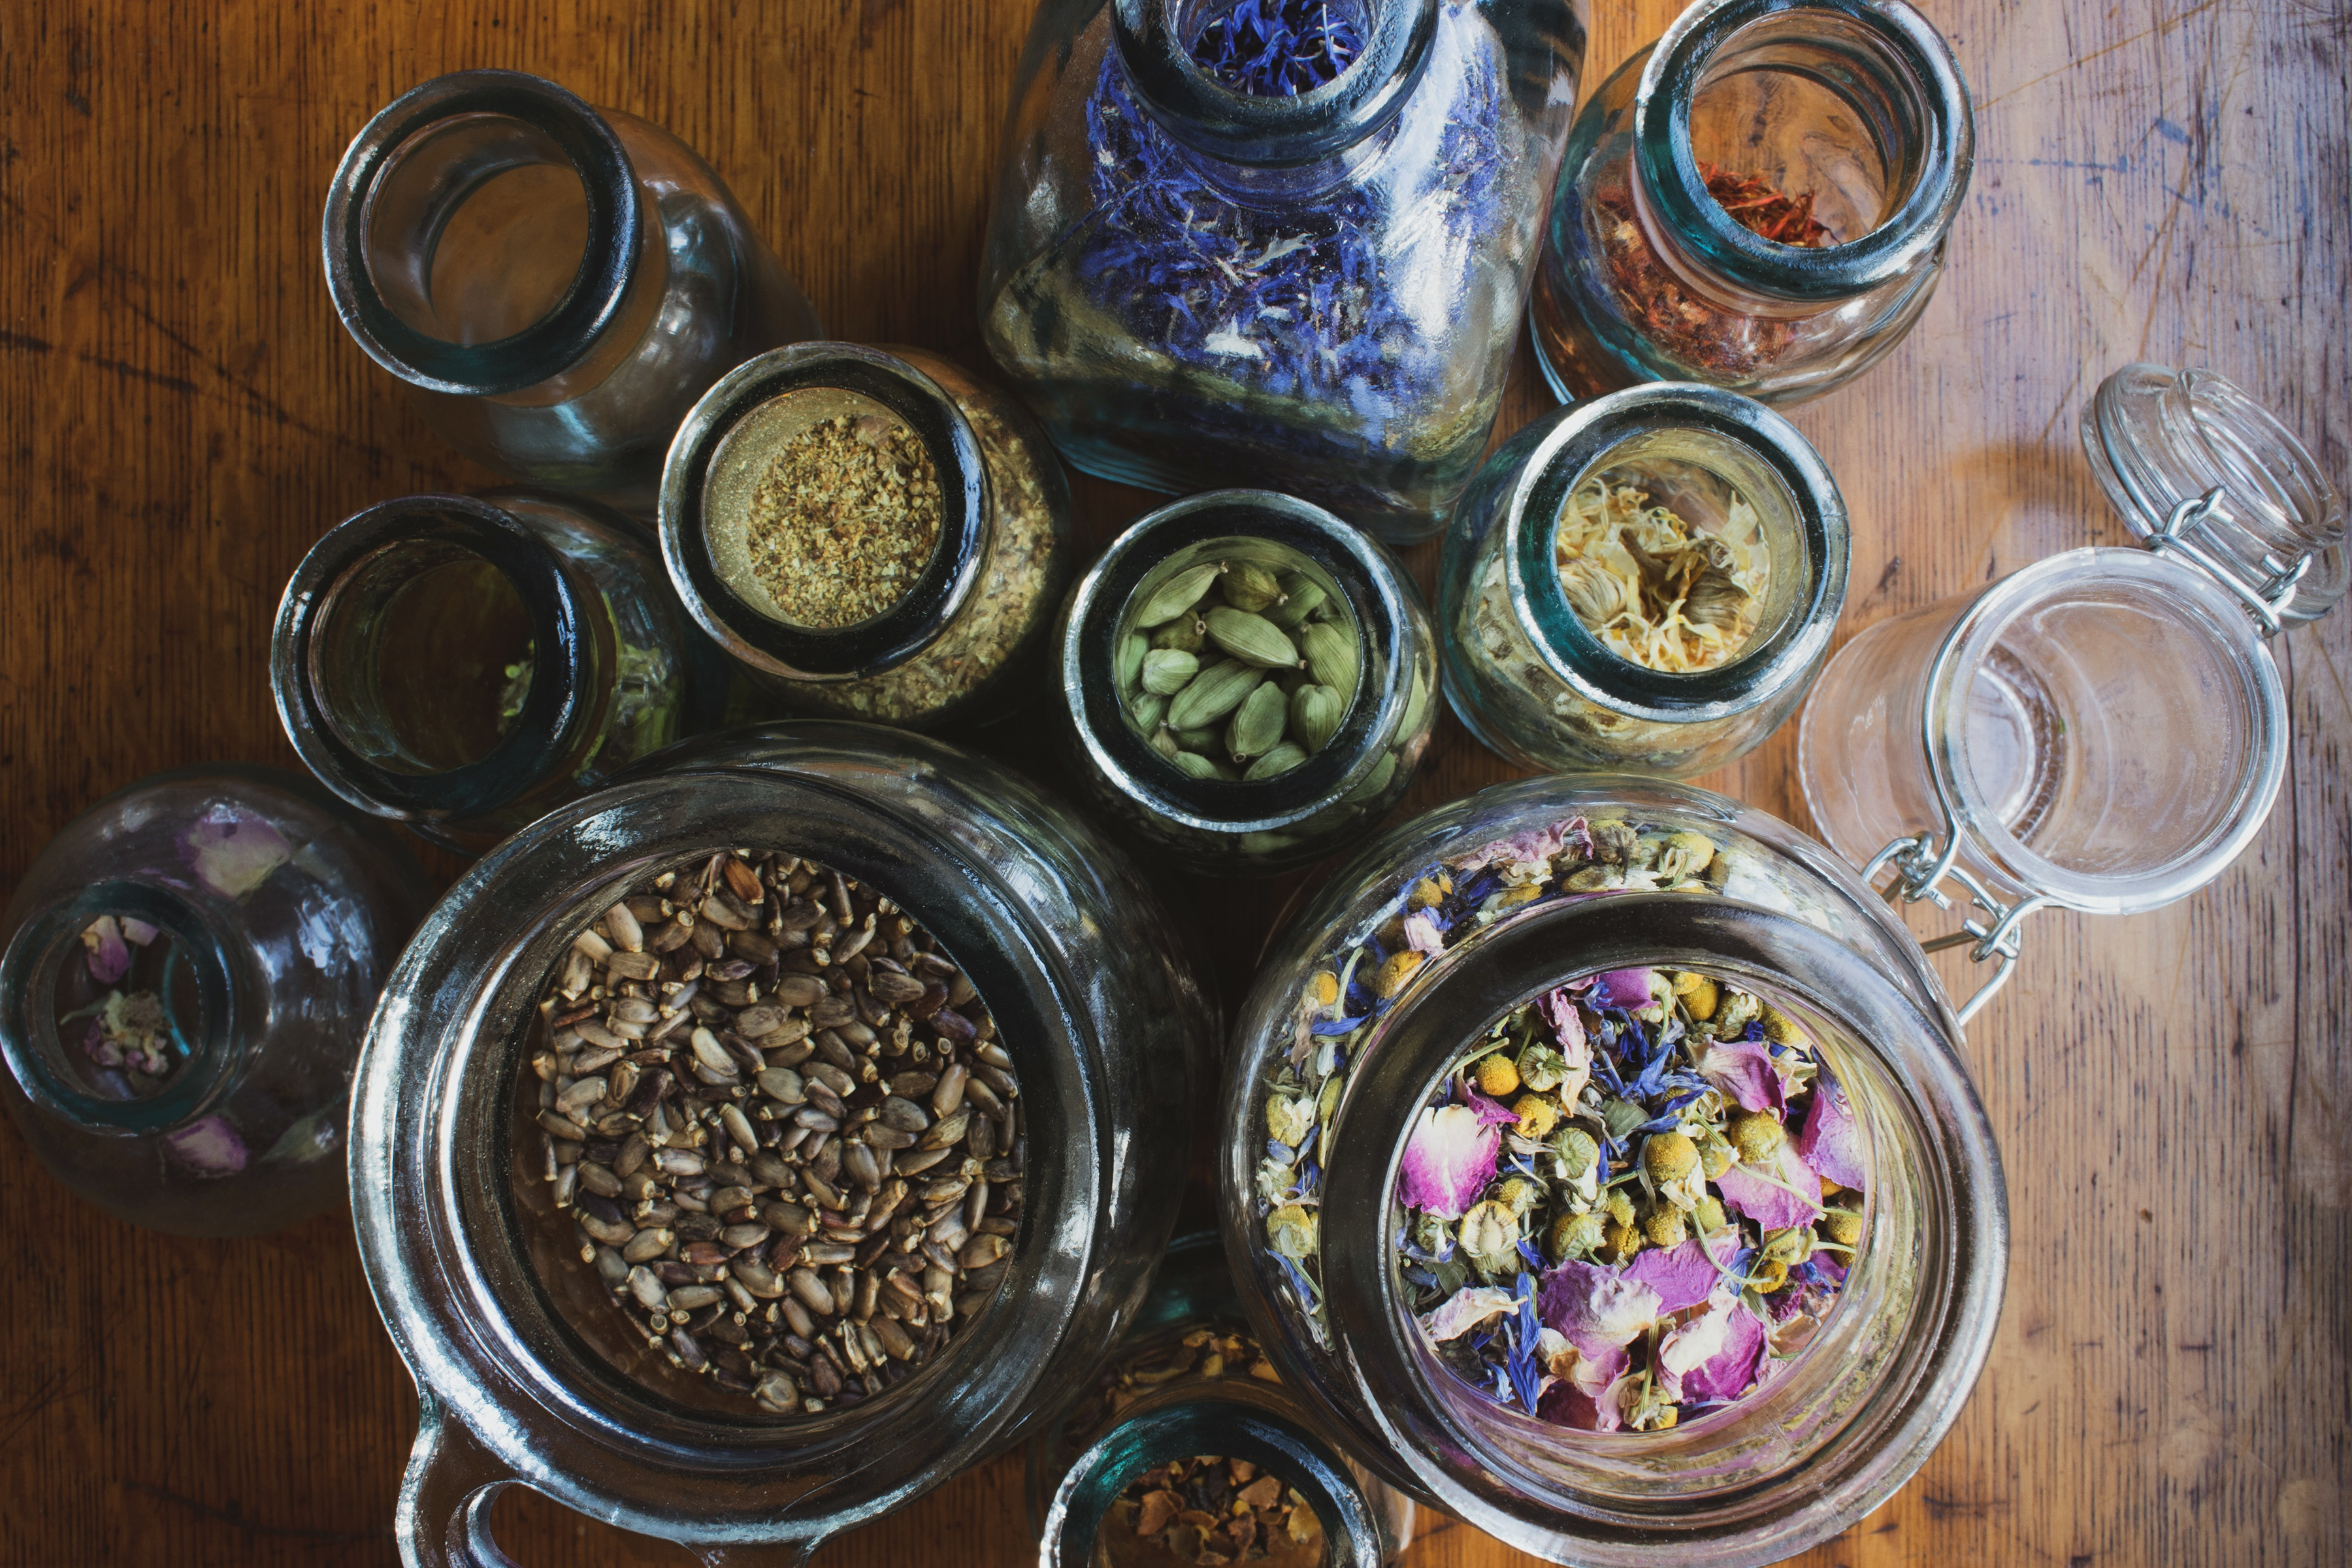 herbs in open glass jars